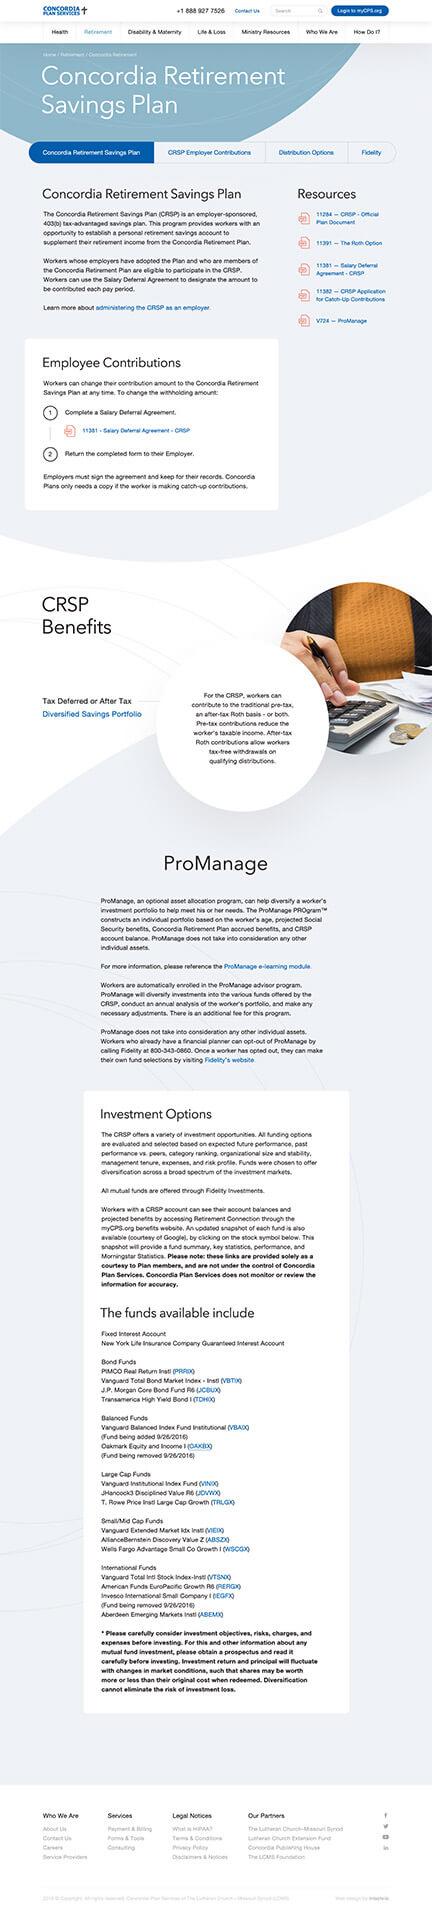 Insurance UX Website Design Case Study - Psychology of Shapes - Page 2